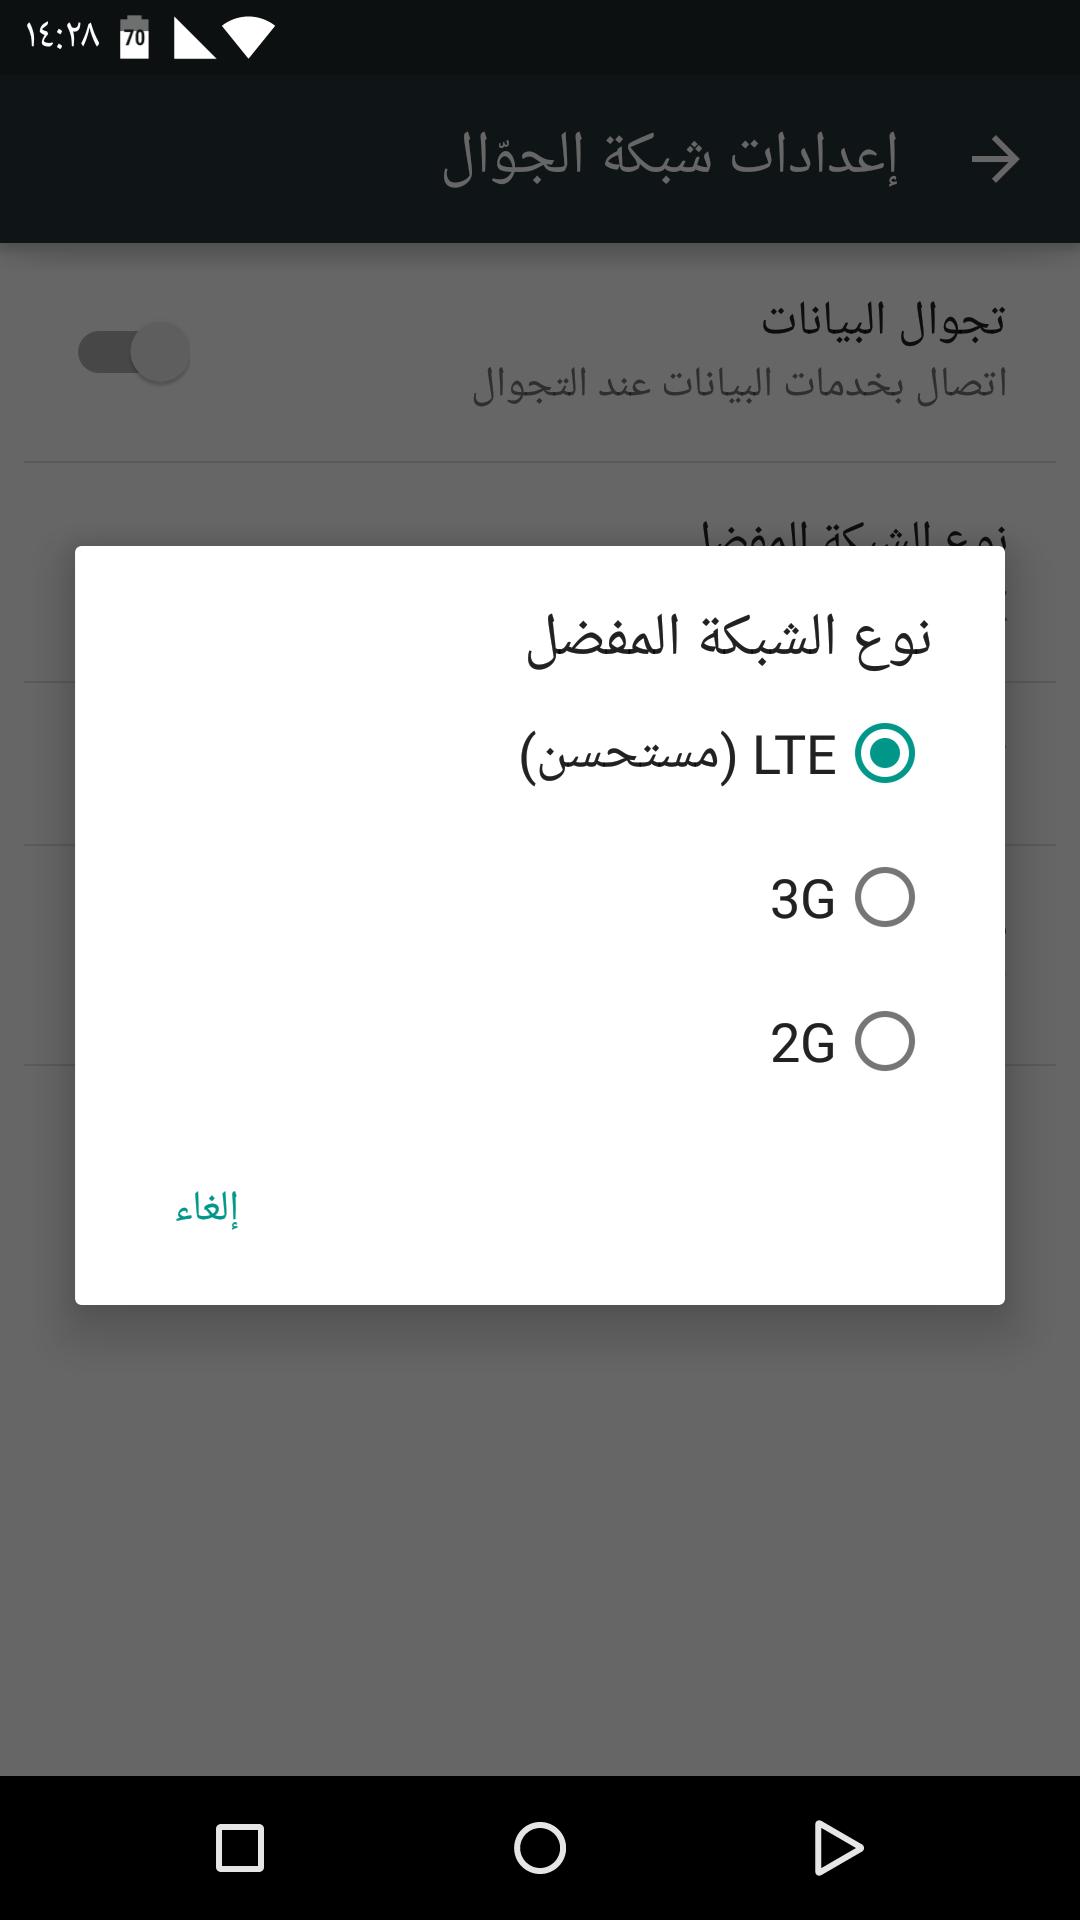 Screenshot_٢٠١٤-١٢-٢١-١٤-٢٨-٠٥